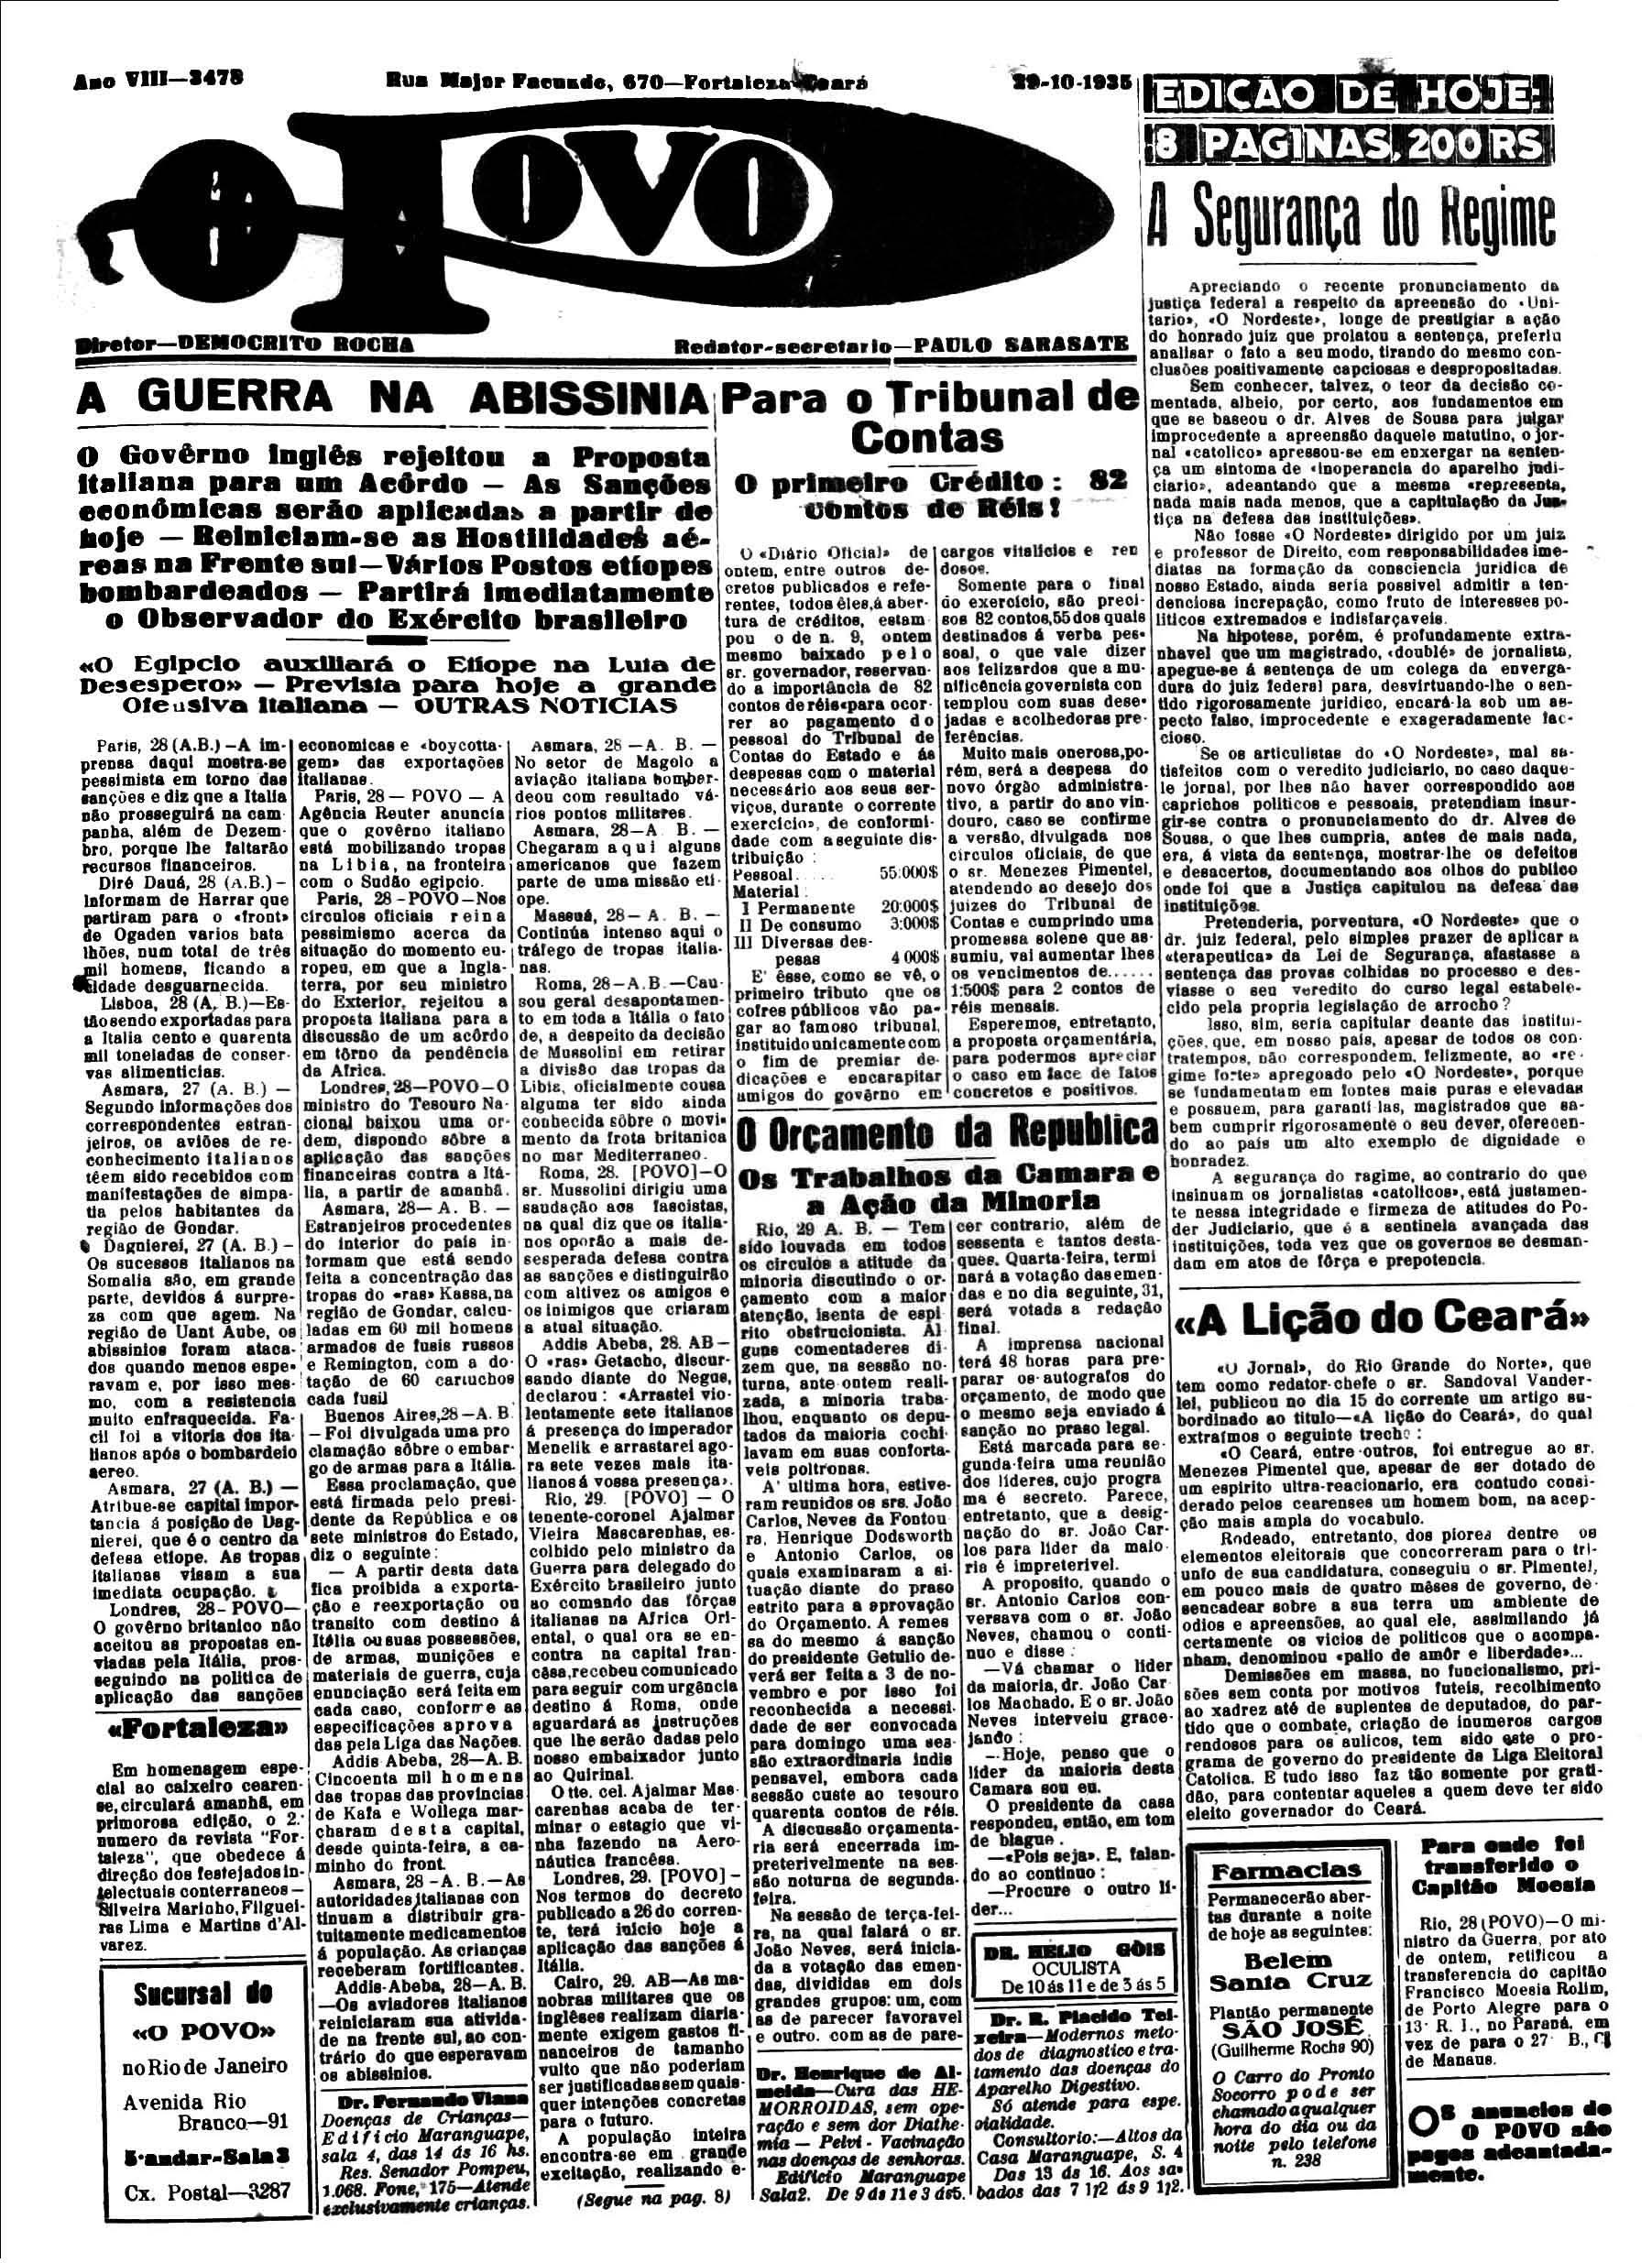 29-10-1935